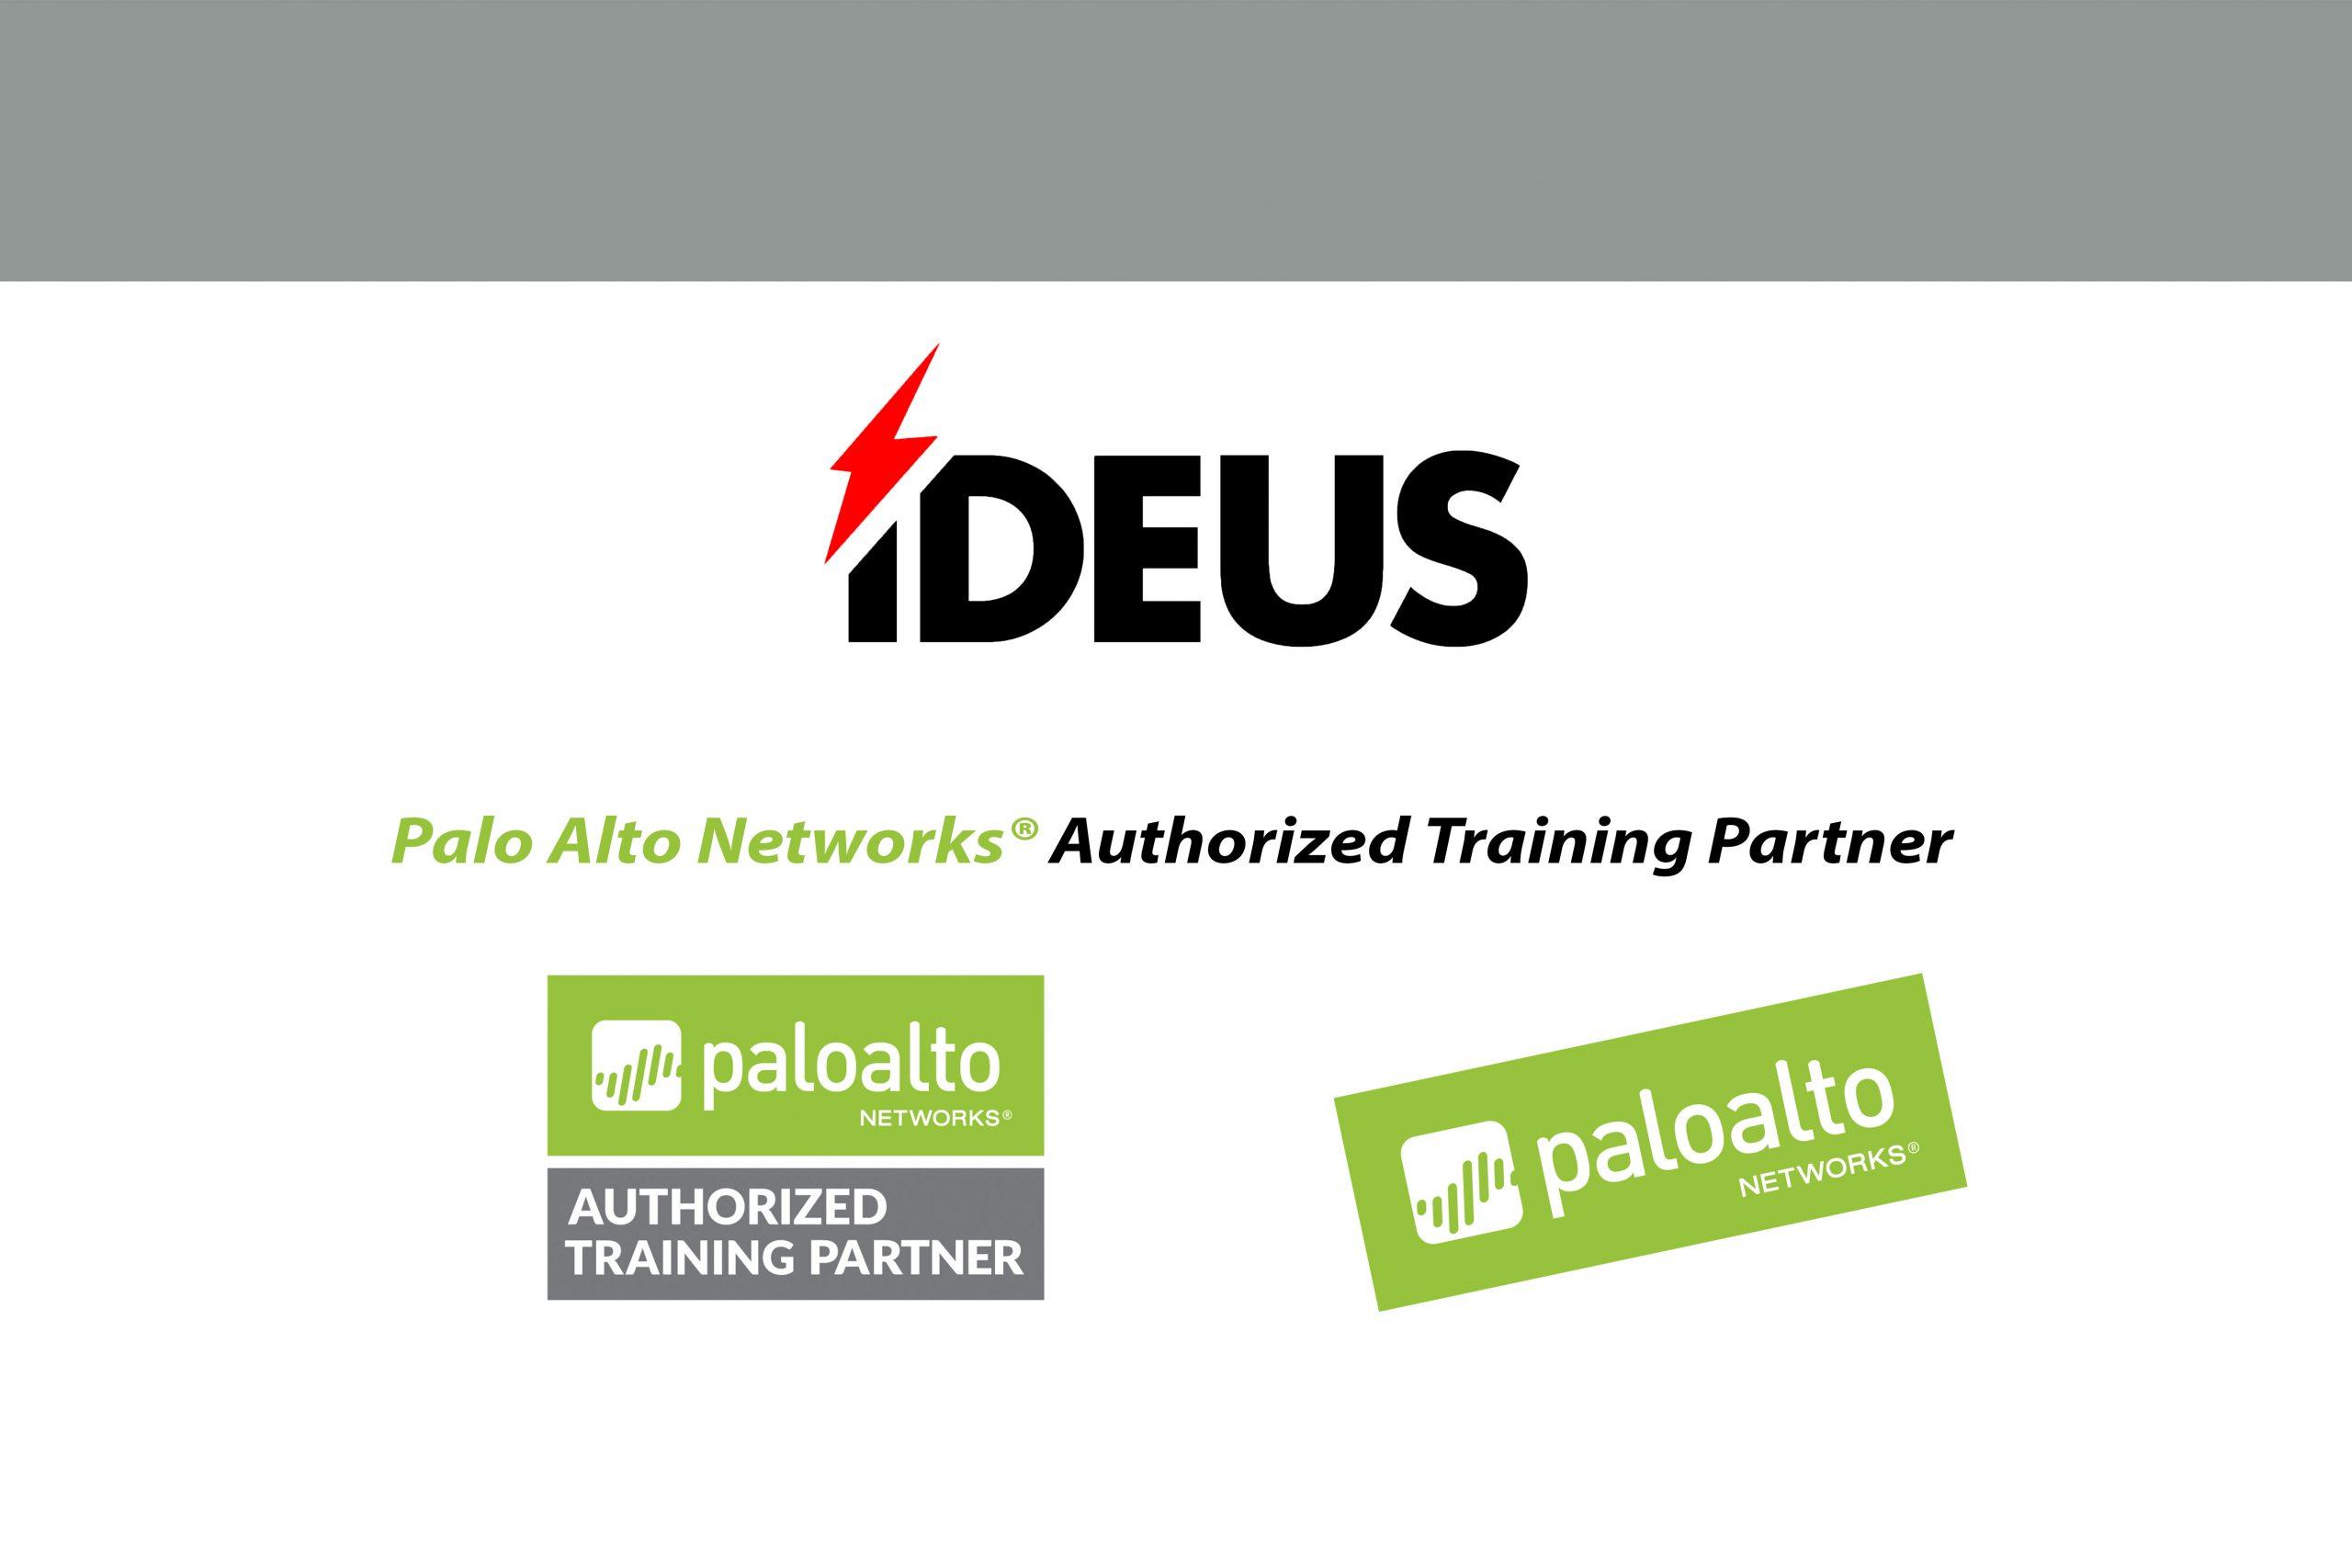 Palo Alto Networks Training Partner